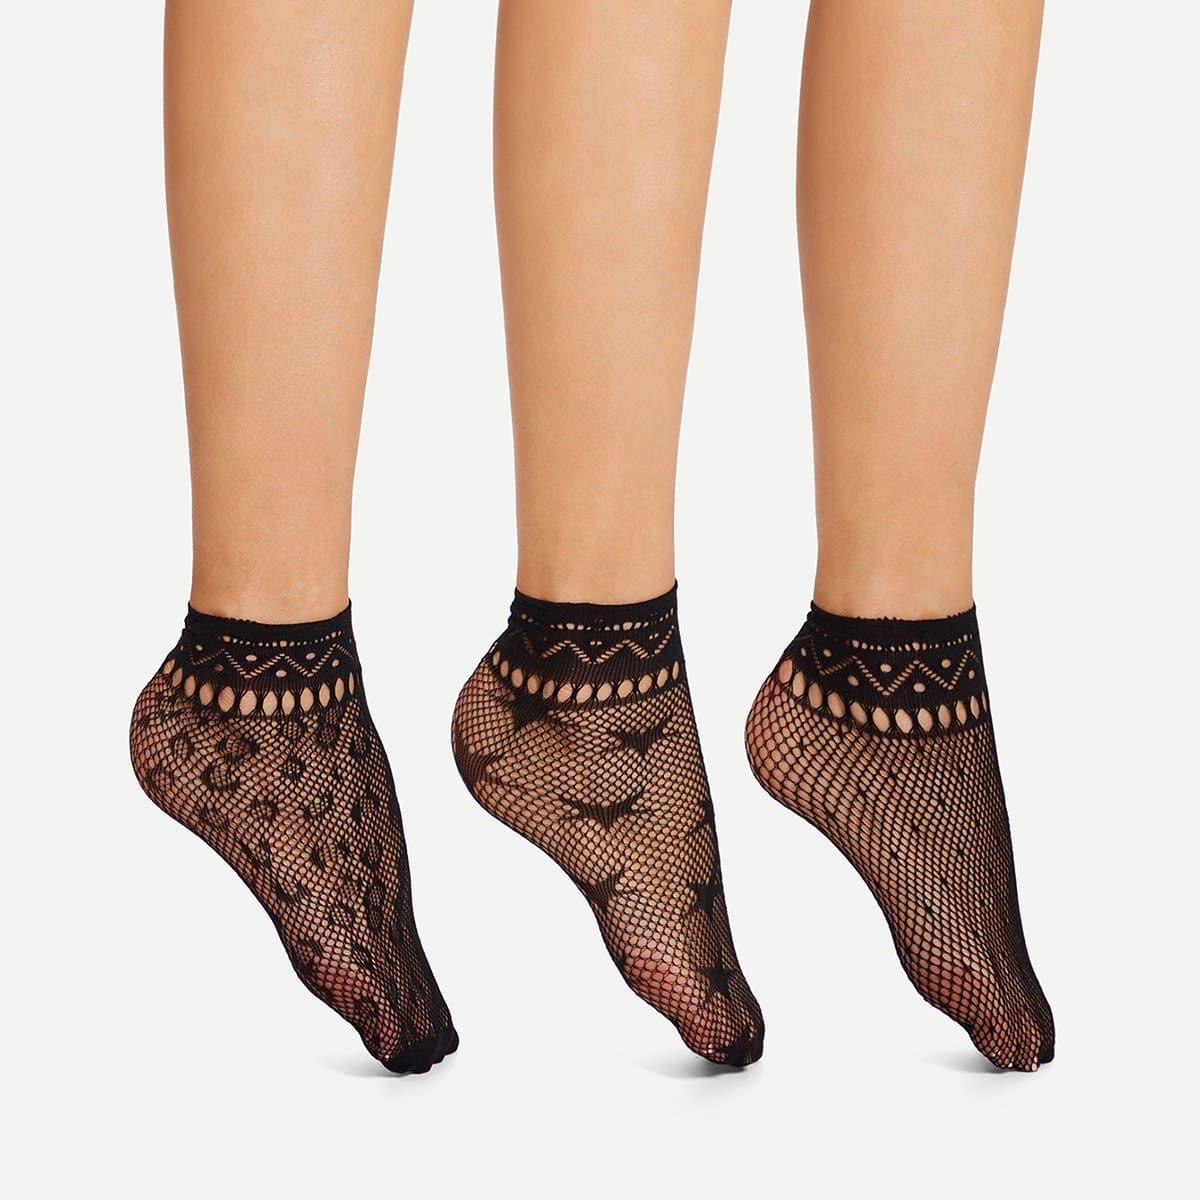 Uitgehold net sokken 3pairs